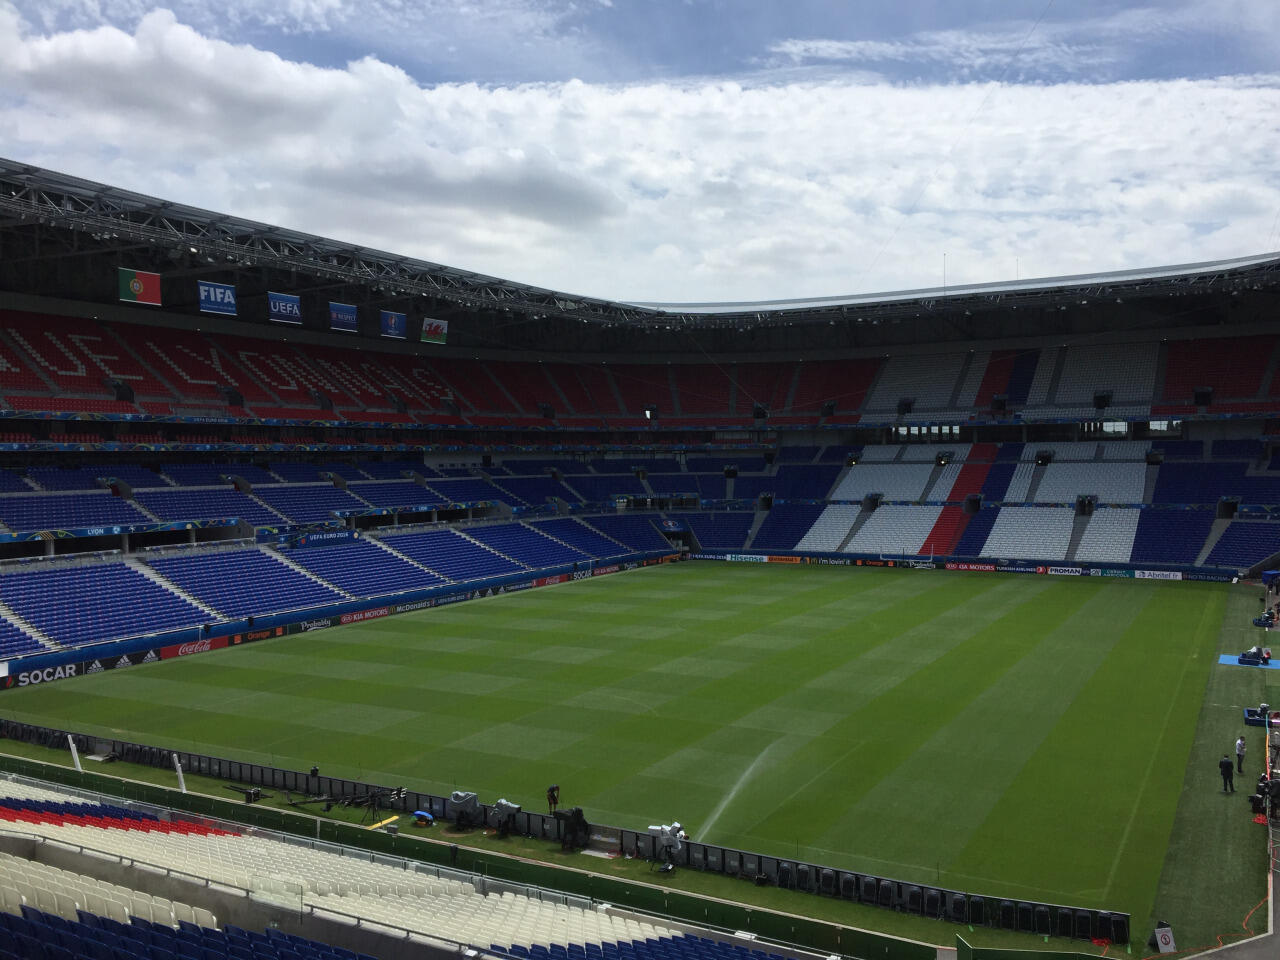 Uwanja wa Stade de Lyon nchini Ufaransa